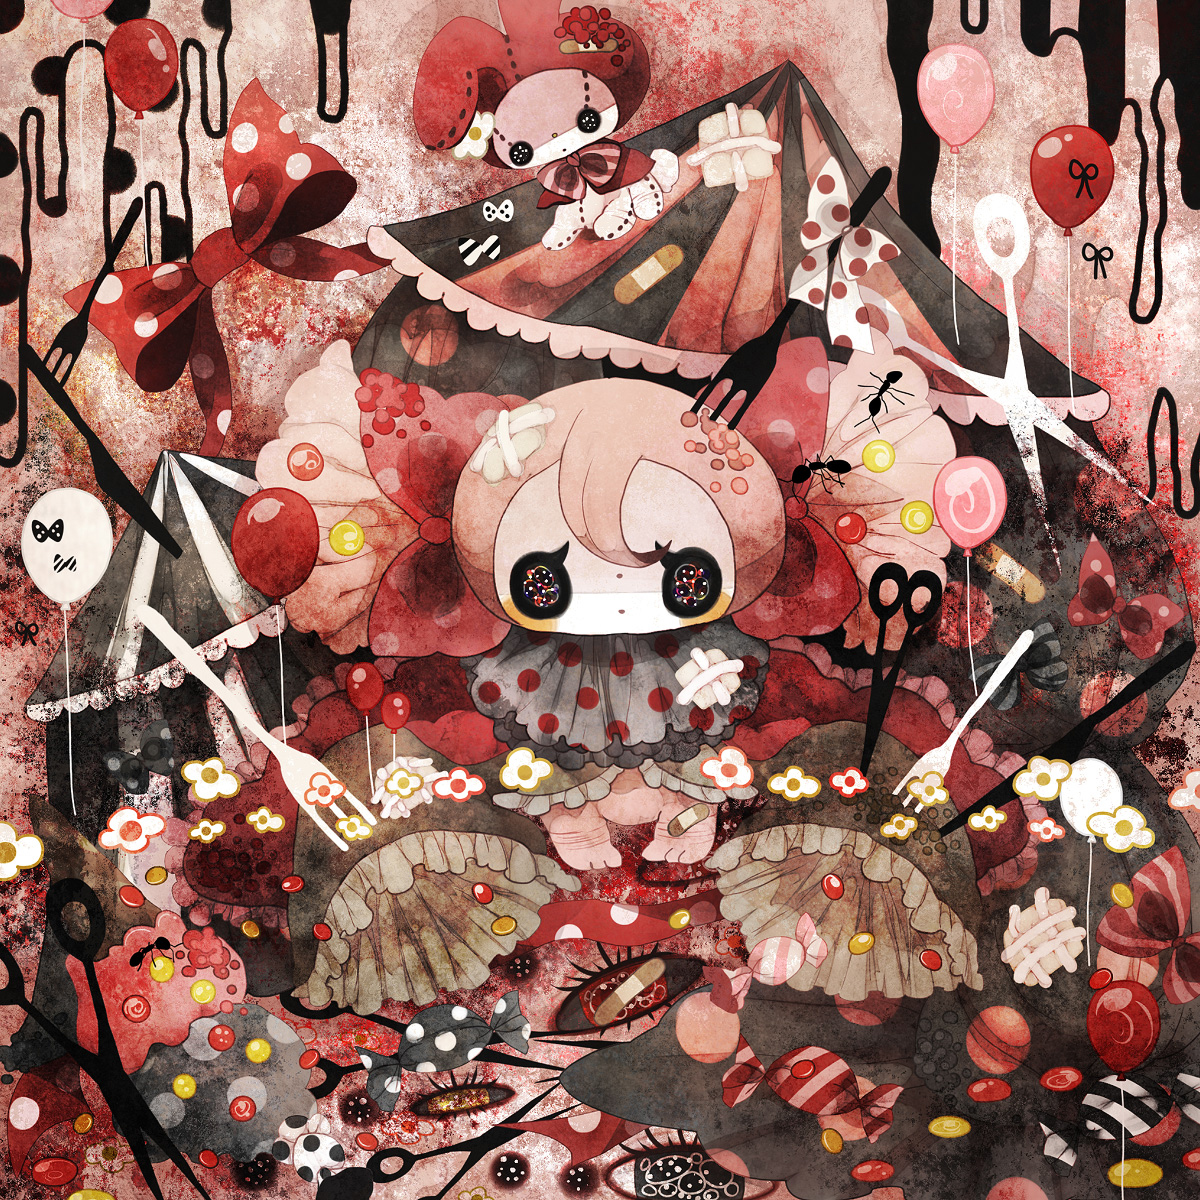 Charlotte Madoka Magica Mahou Shoujo Madoka Magica Zerochan Anime Image Board